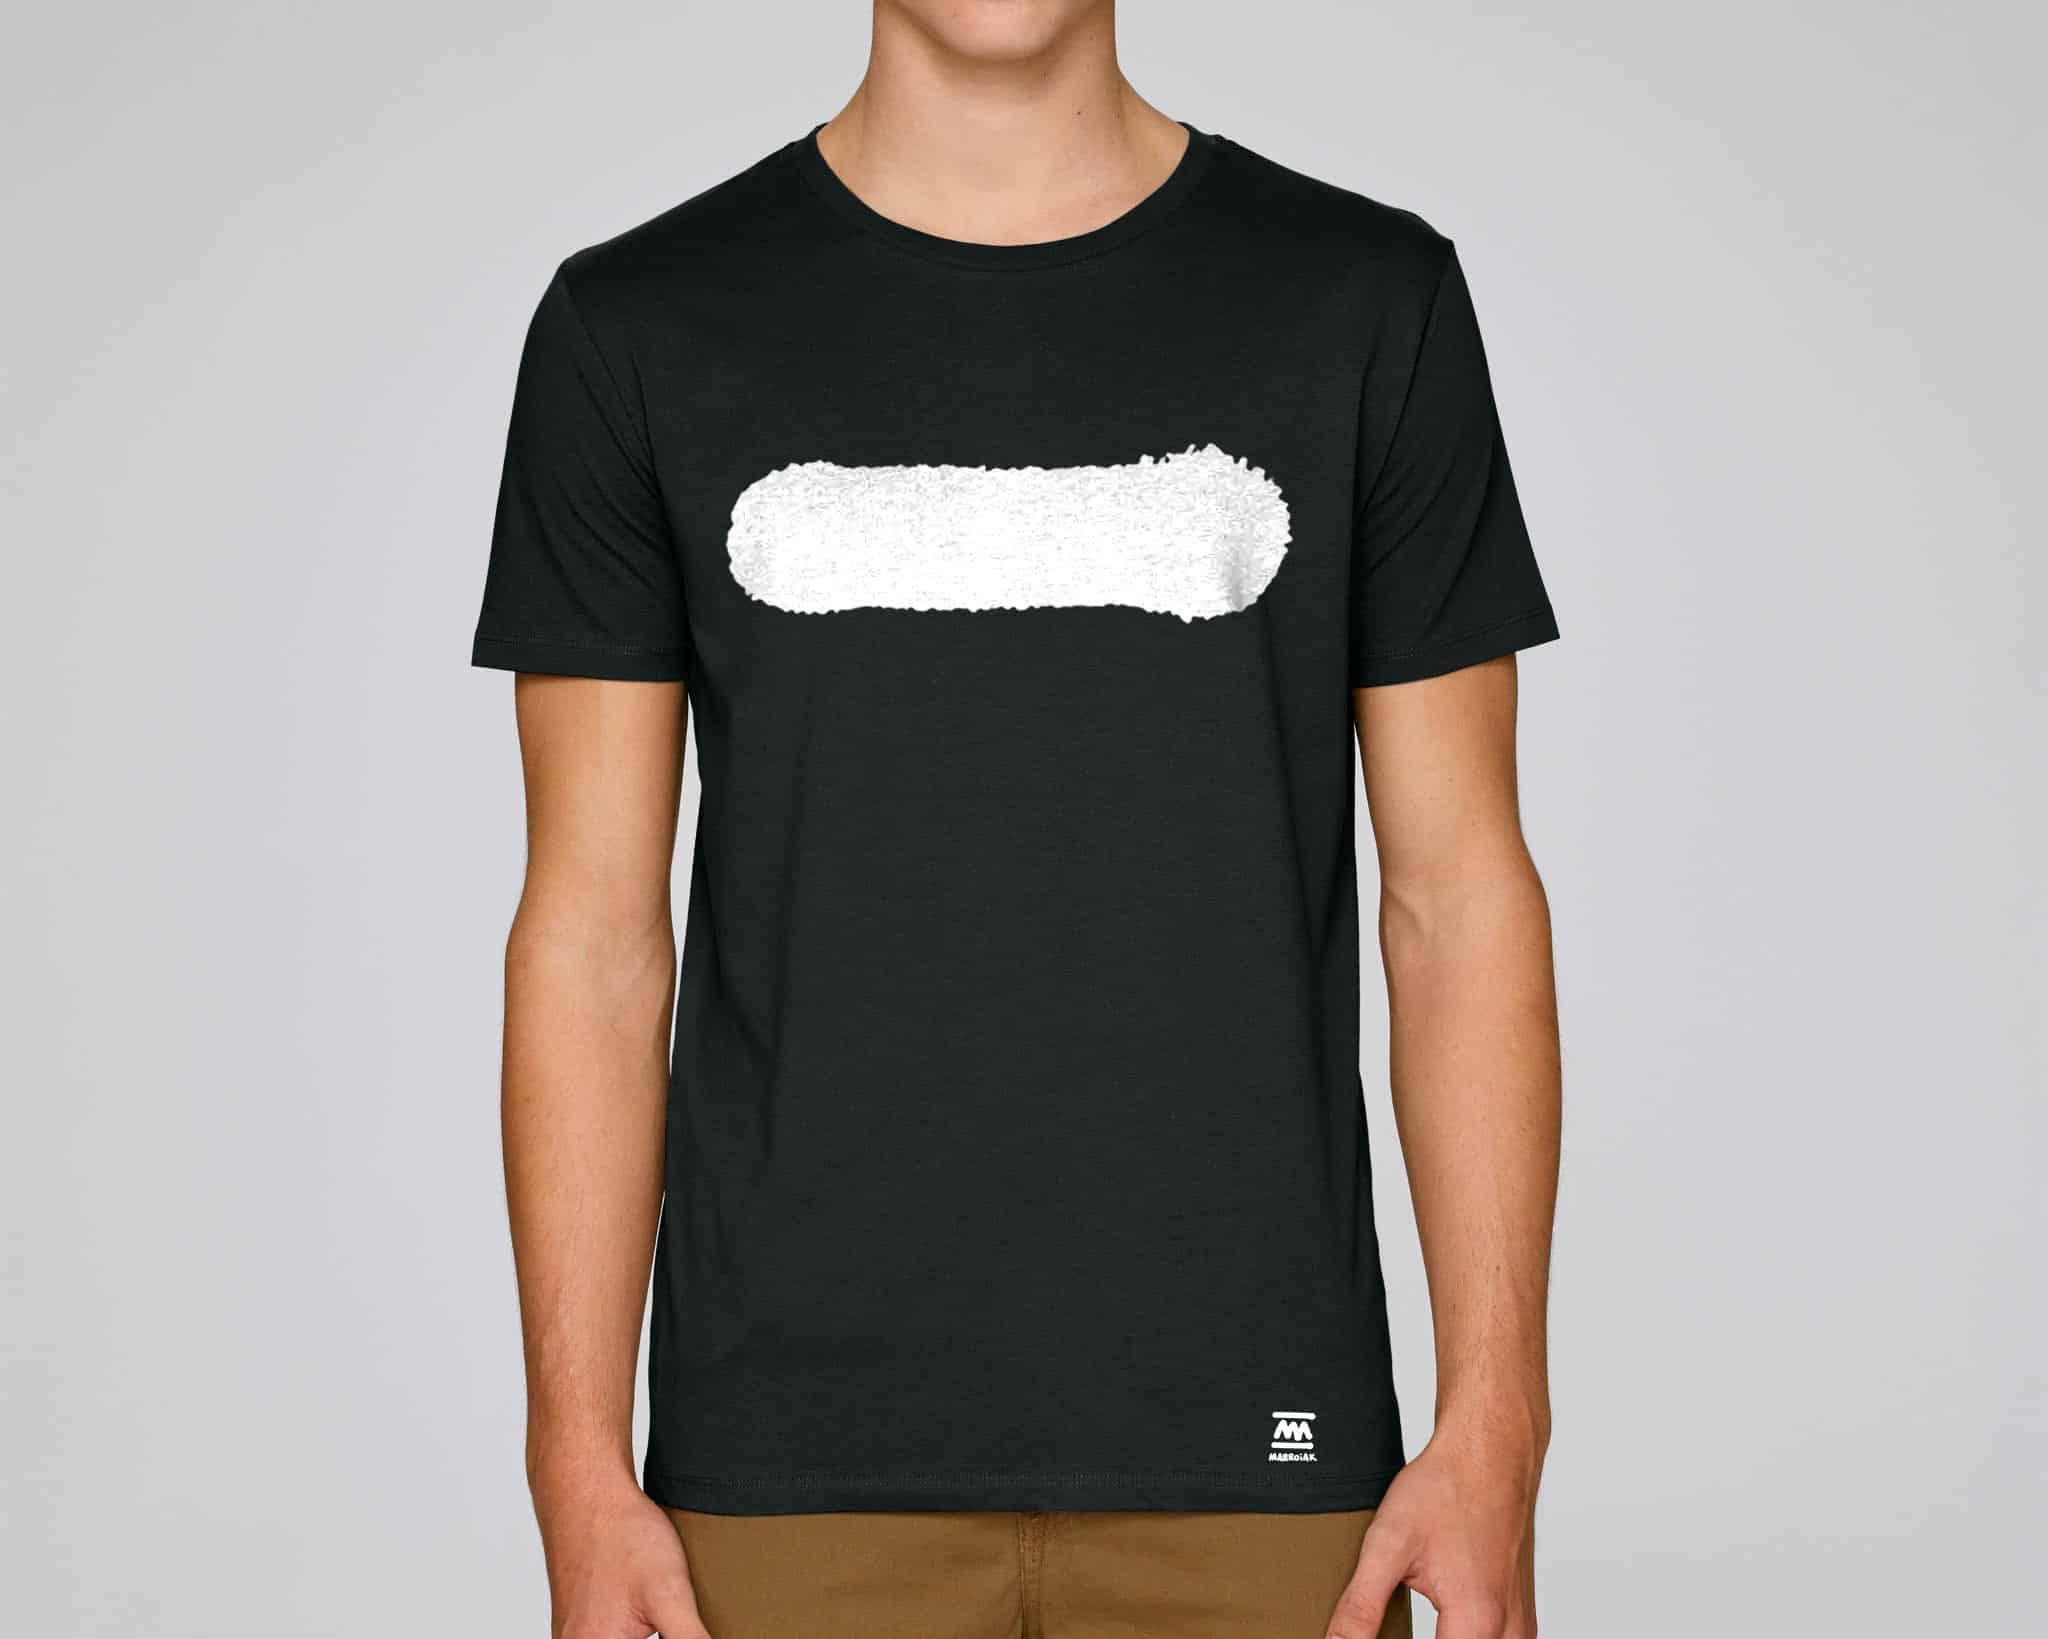 RAYA - Camiseta minimalista negra